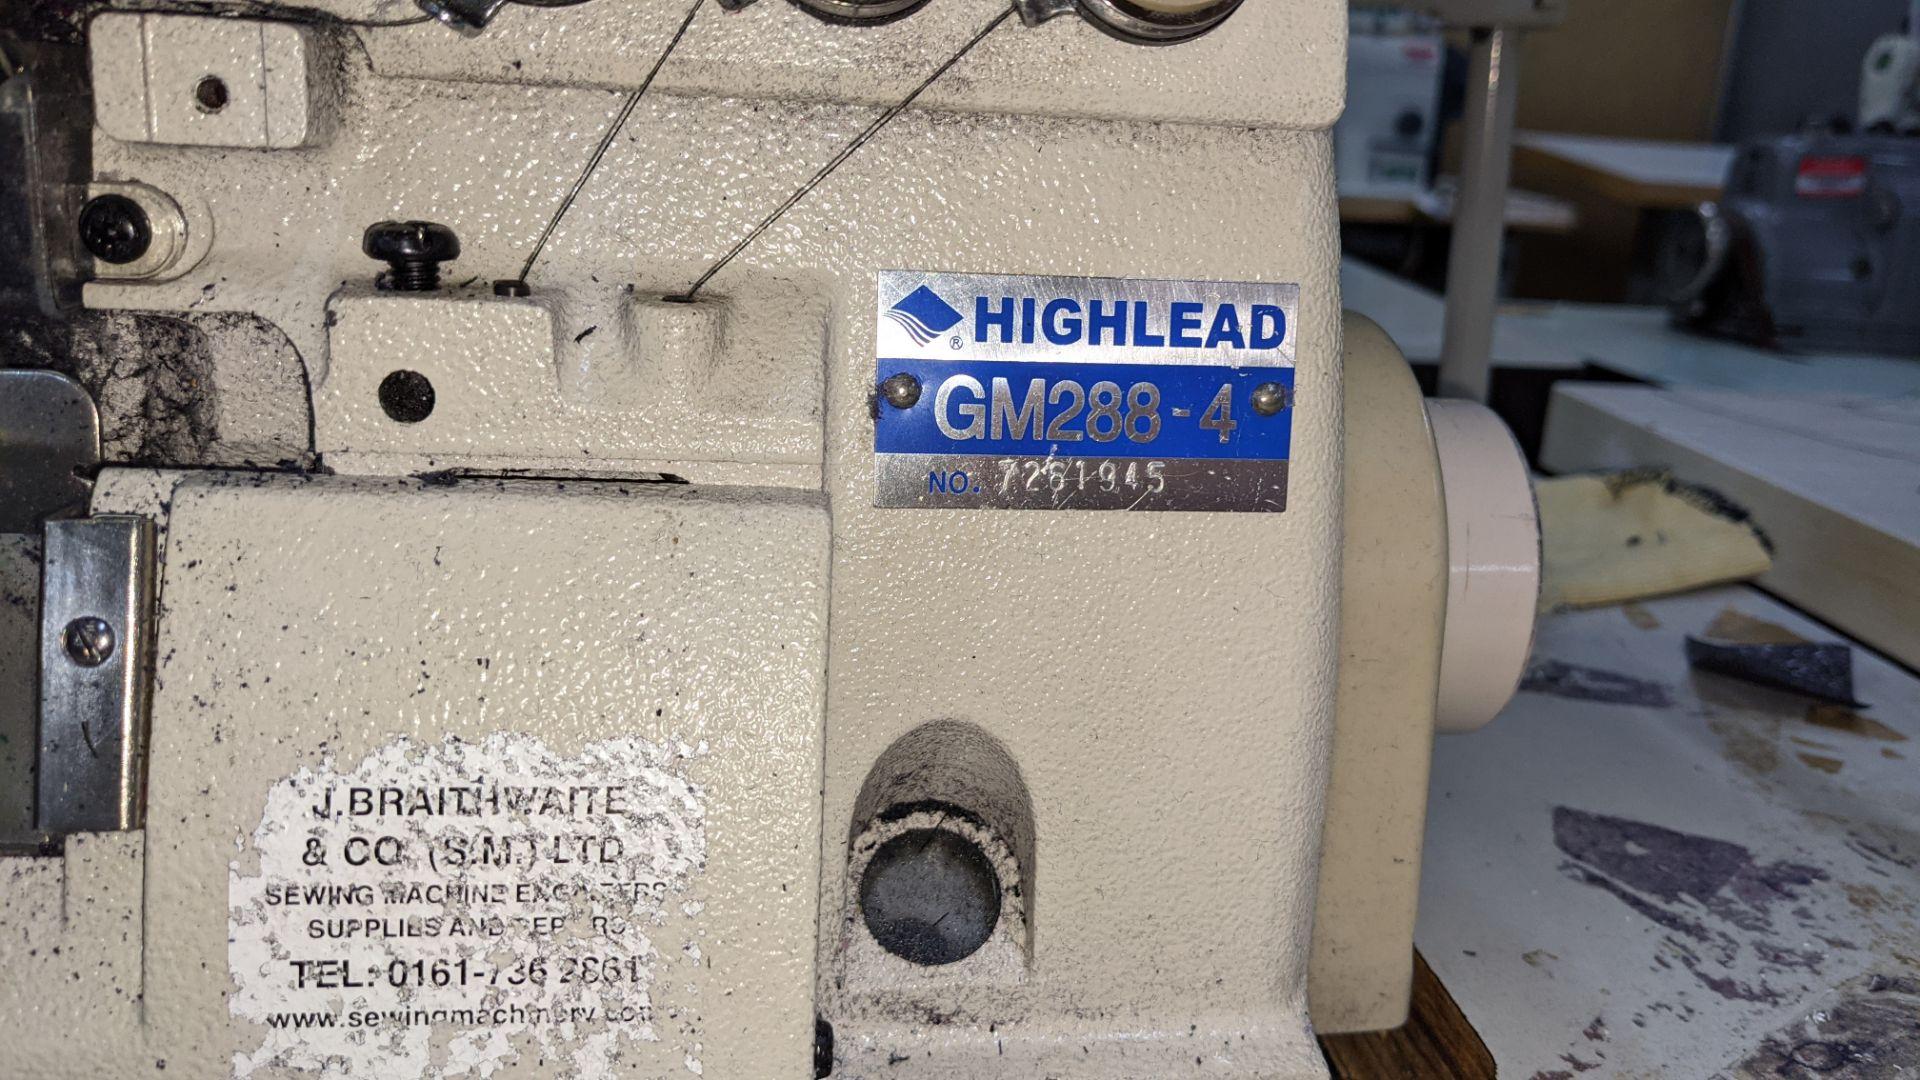 Highlead overlocker model GM288-4 - Image 9 of 16